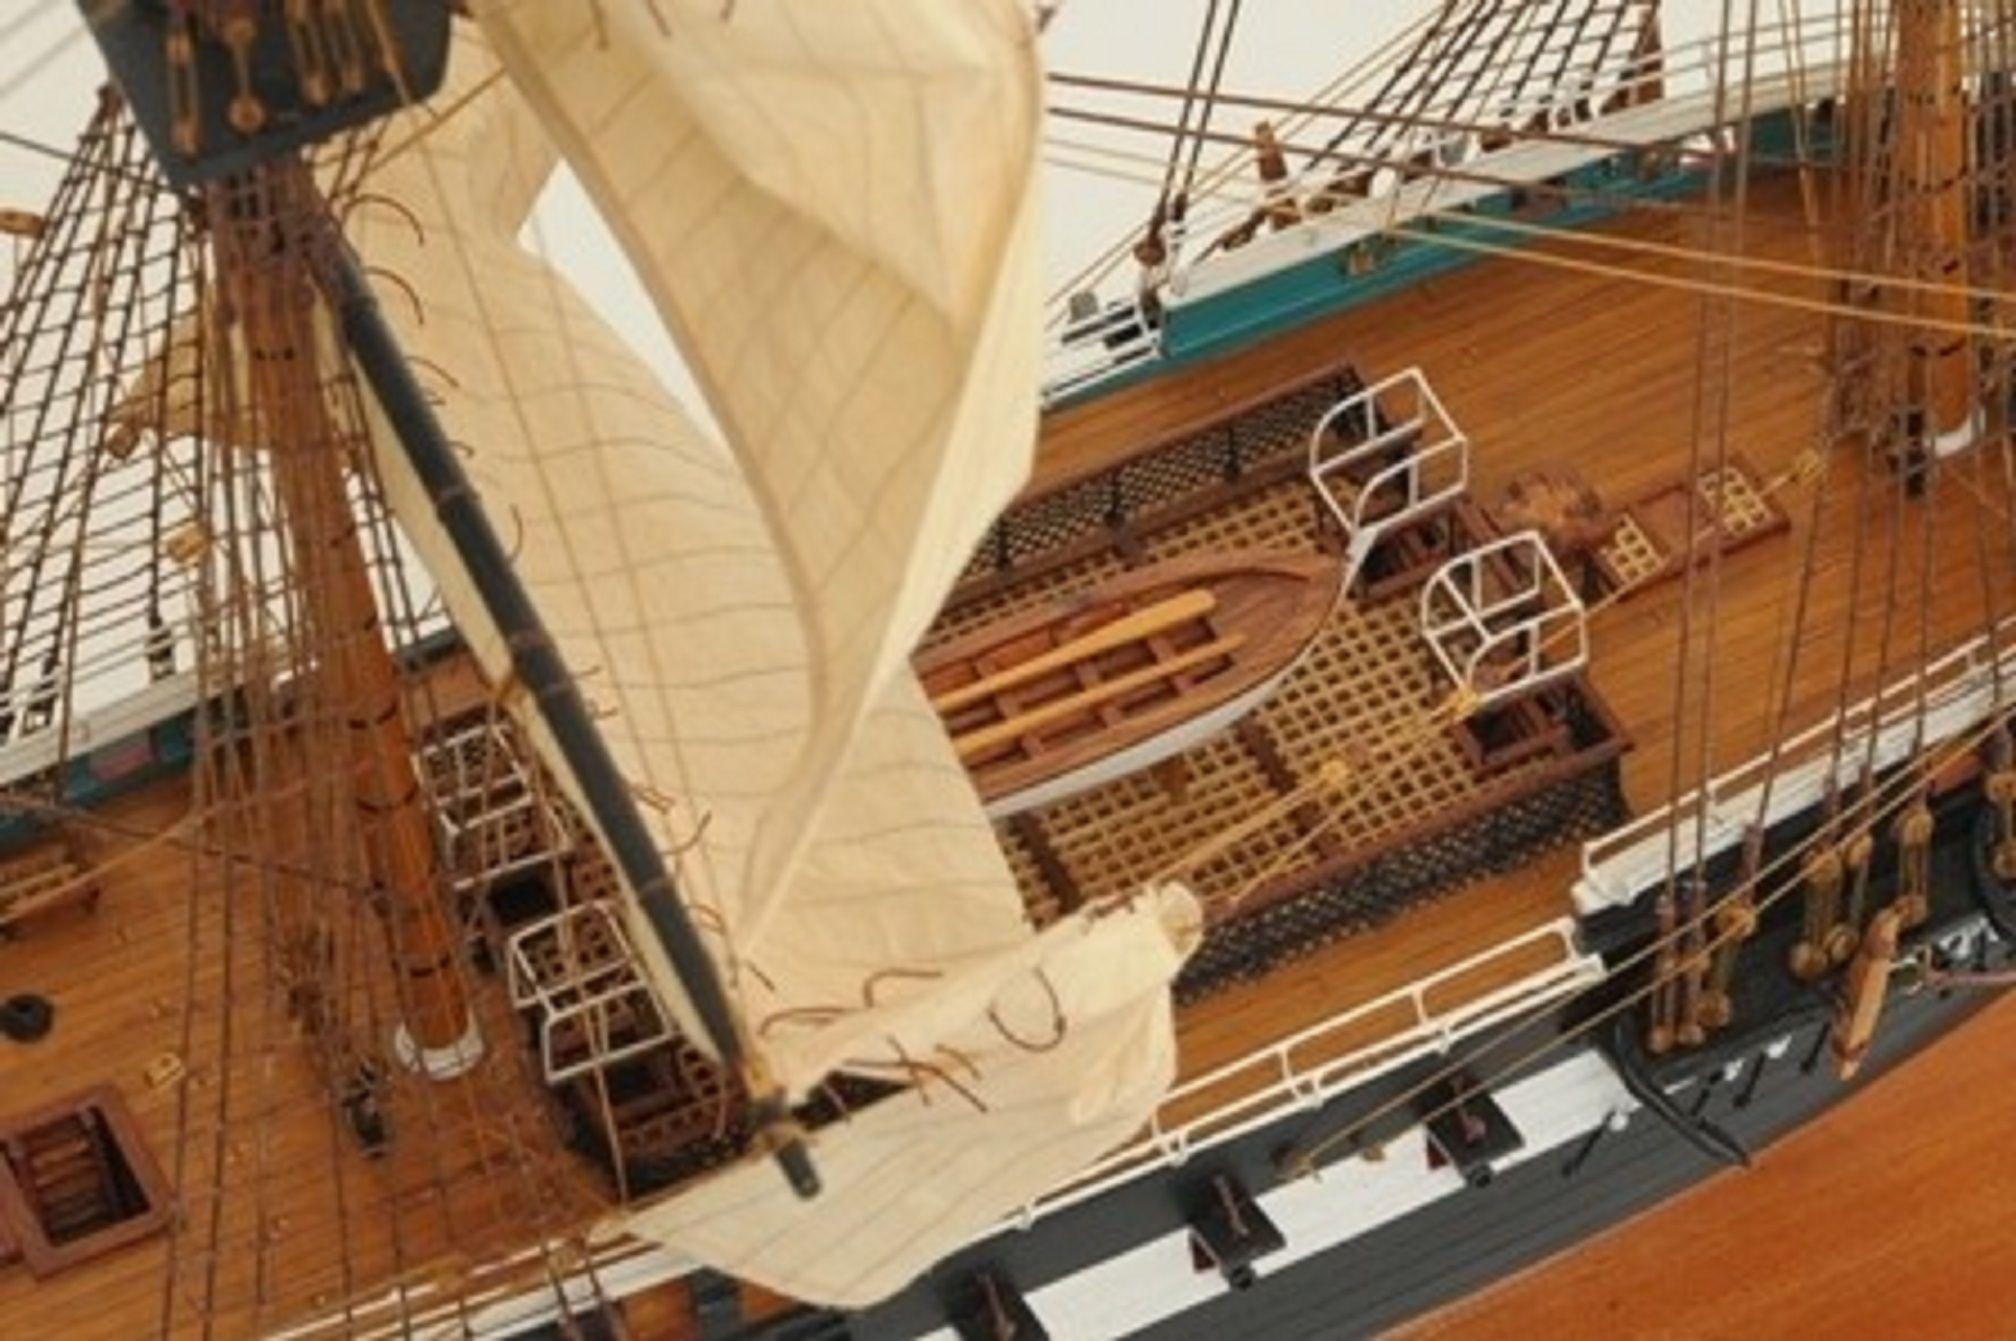 1059-7412-HMS-Trincomalee-Ship-Model-Premier-Range